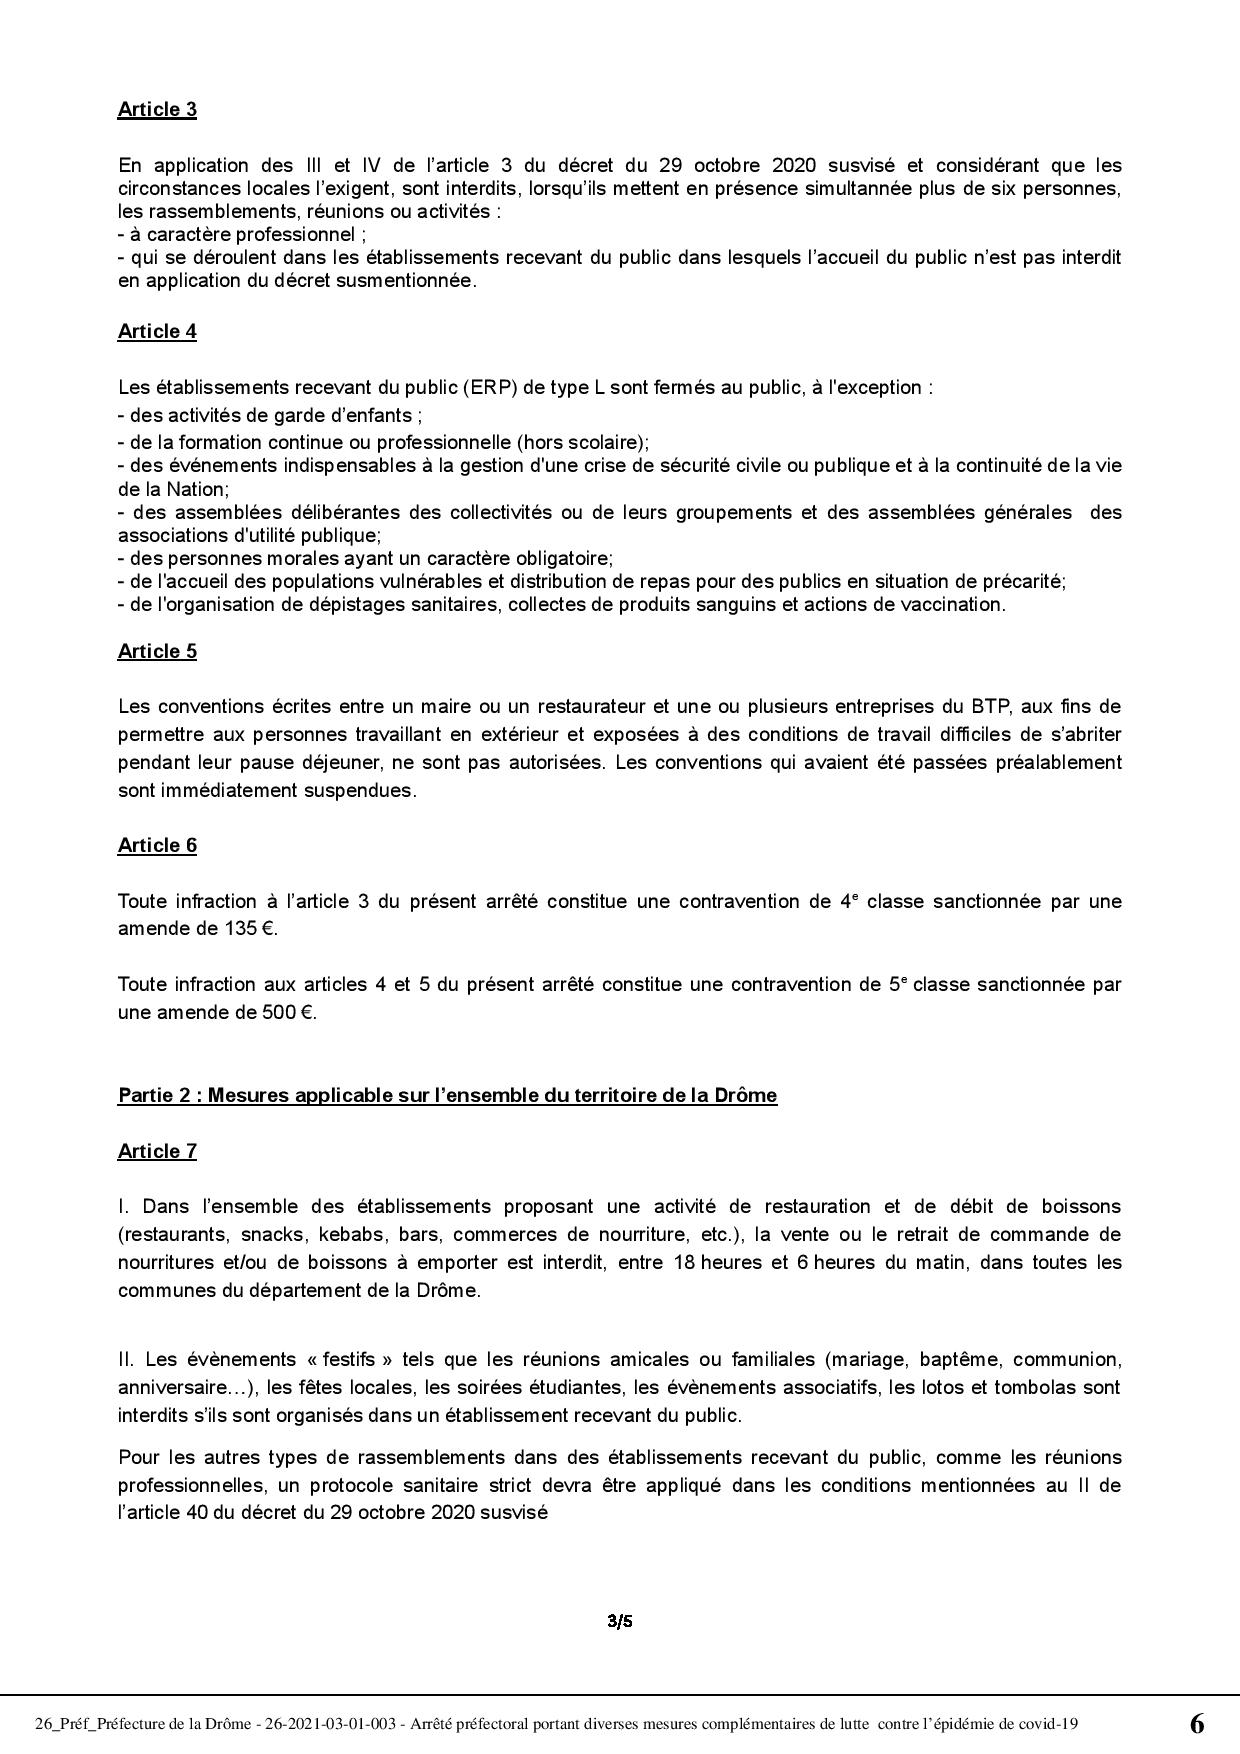 recueil-26-2021-043-recueil-des-actes-administratifs-special_1_-2-page-006.jpg